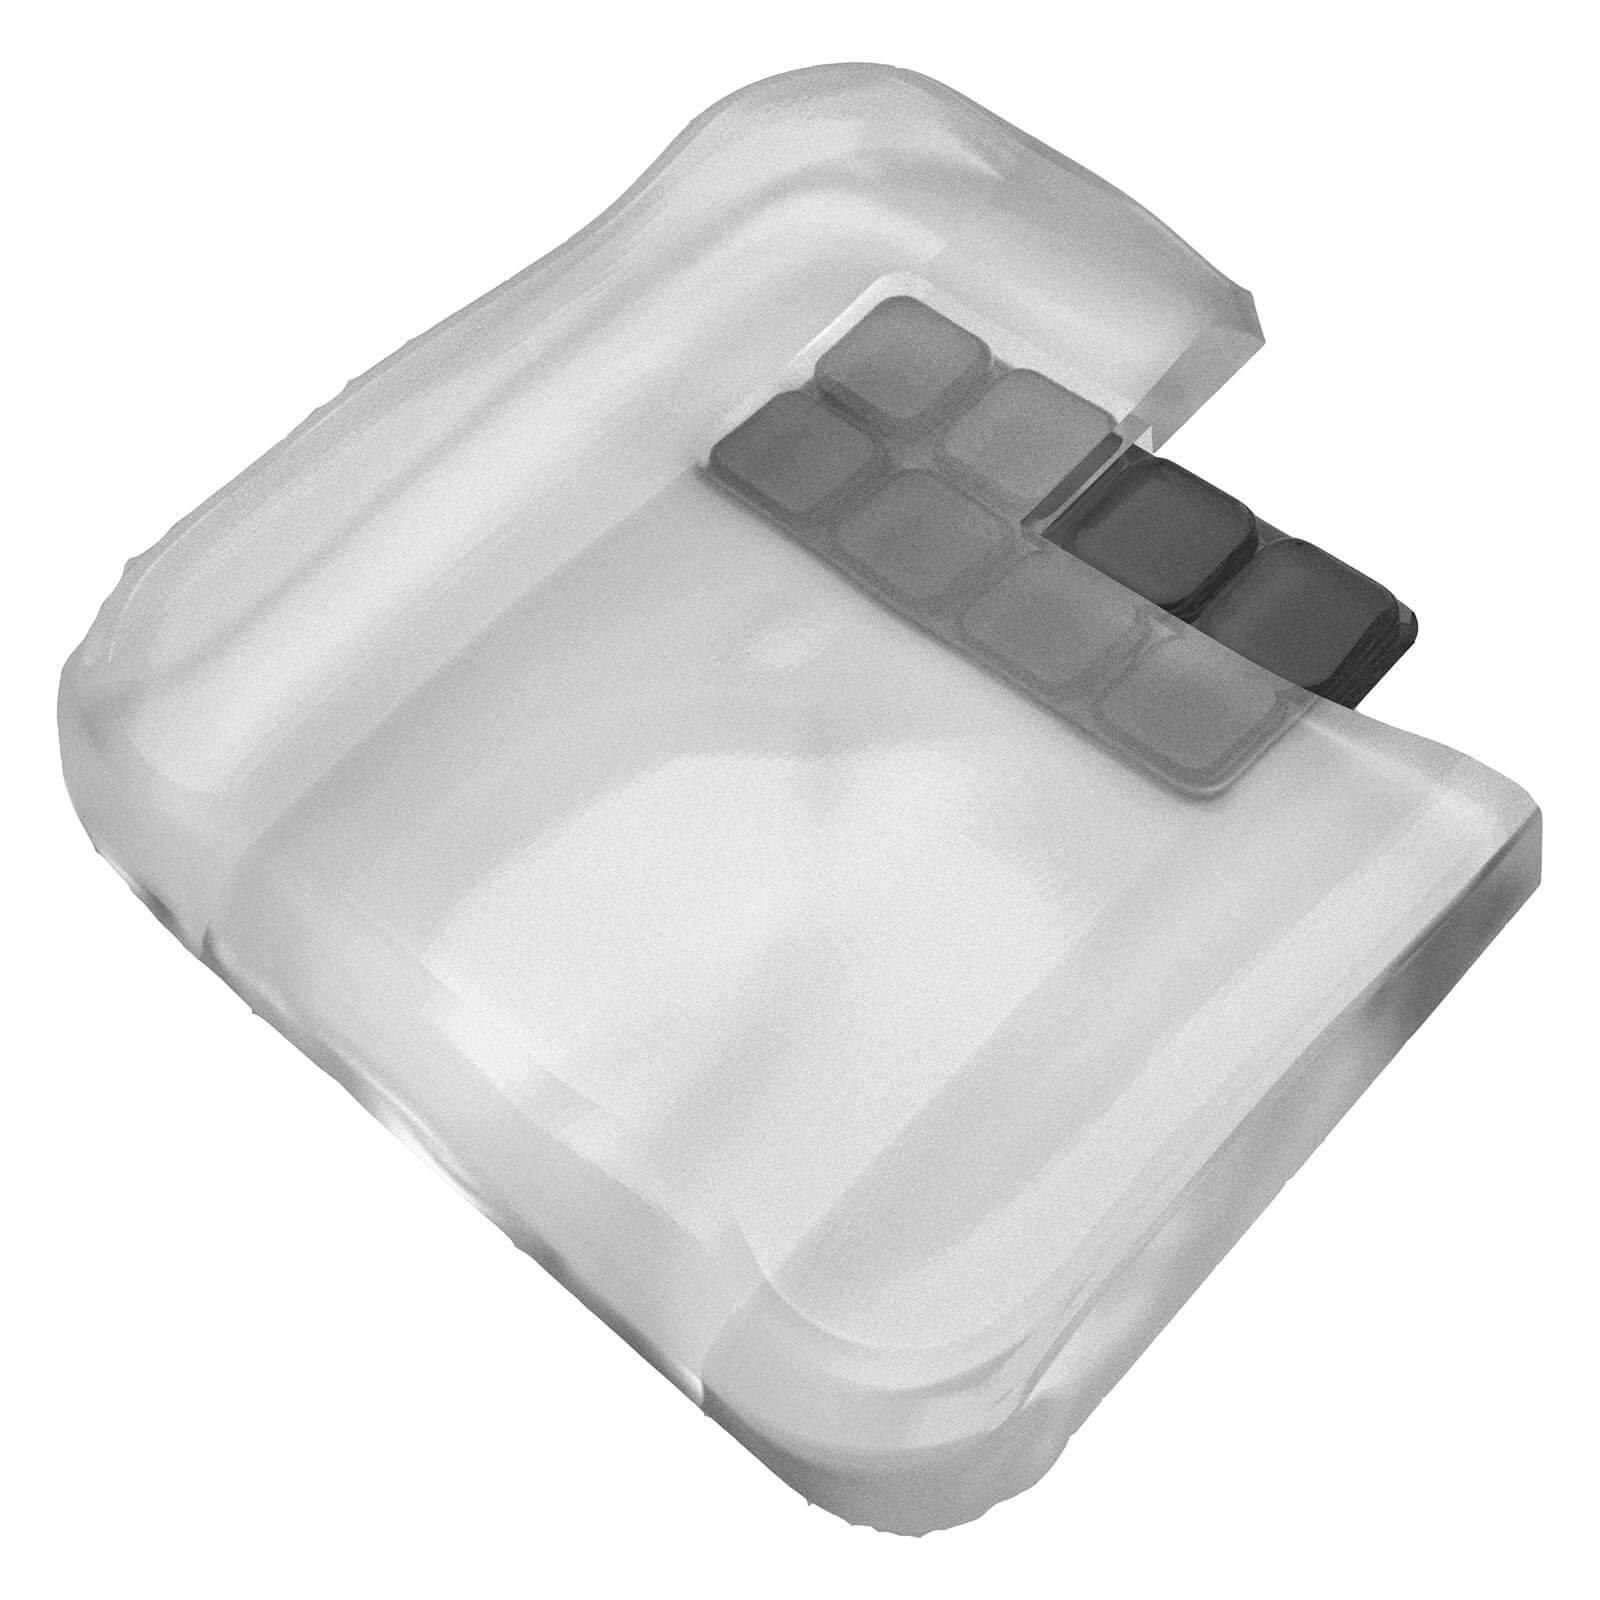 almofada anti escaras roho airlite